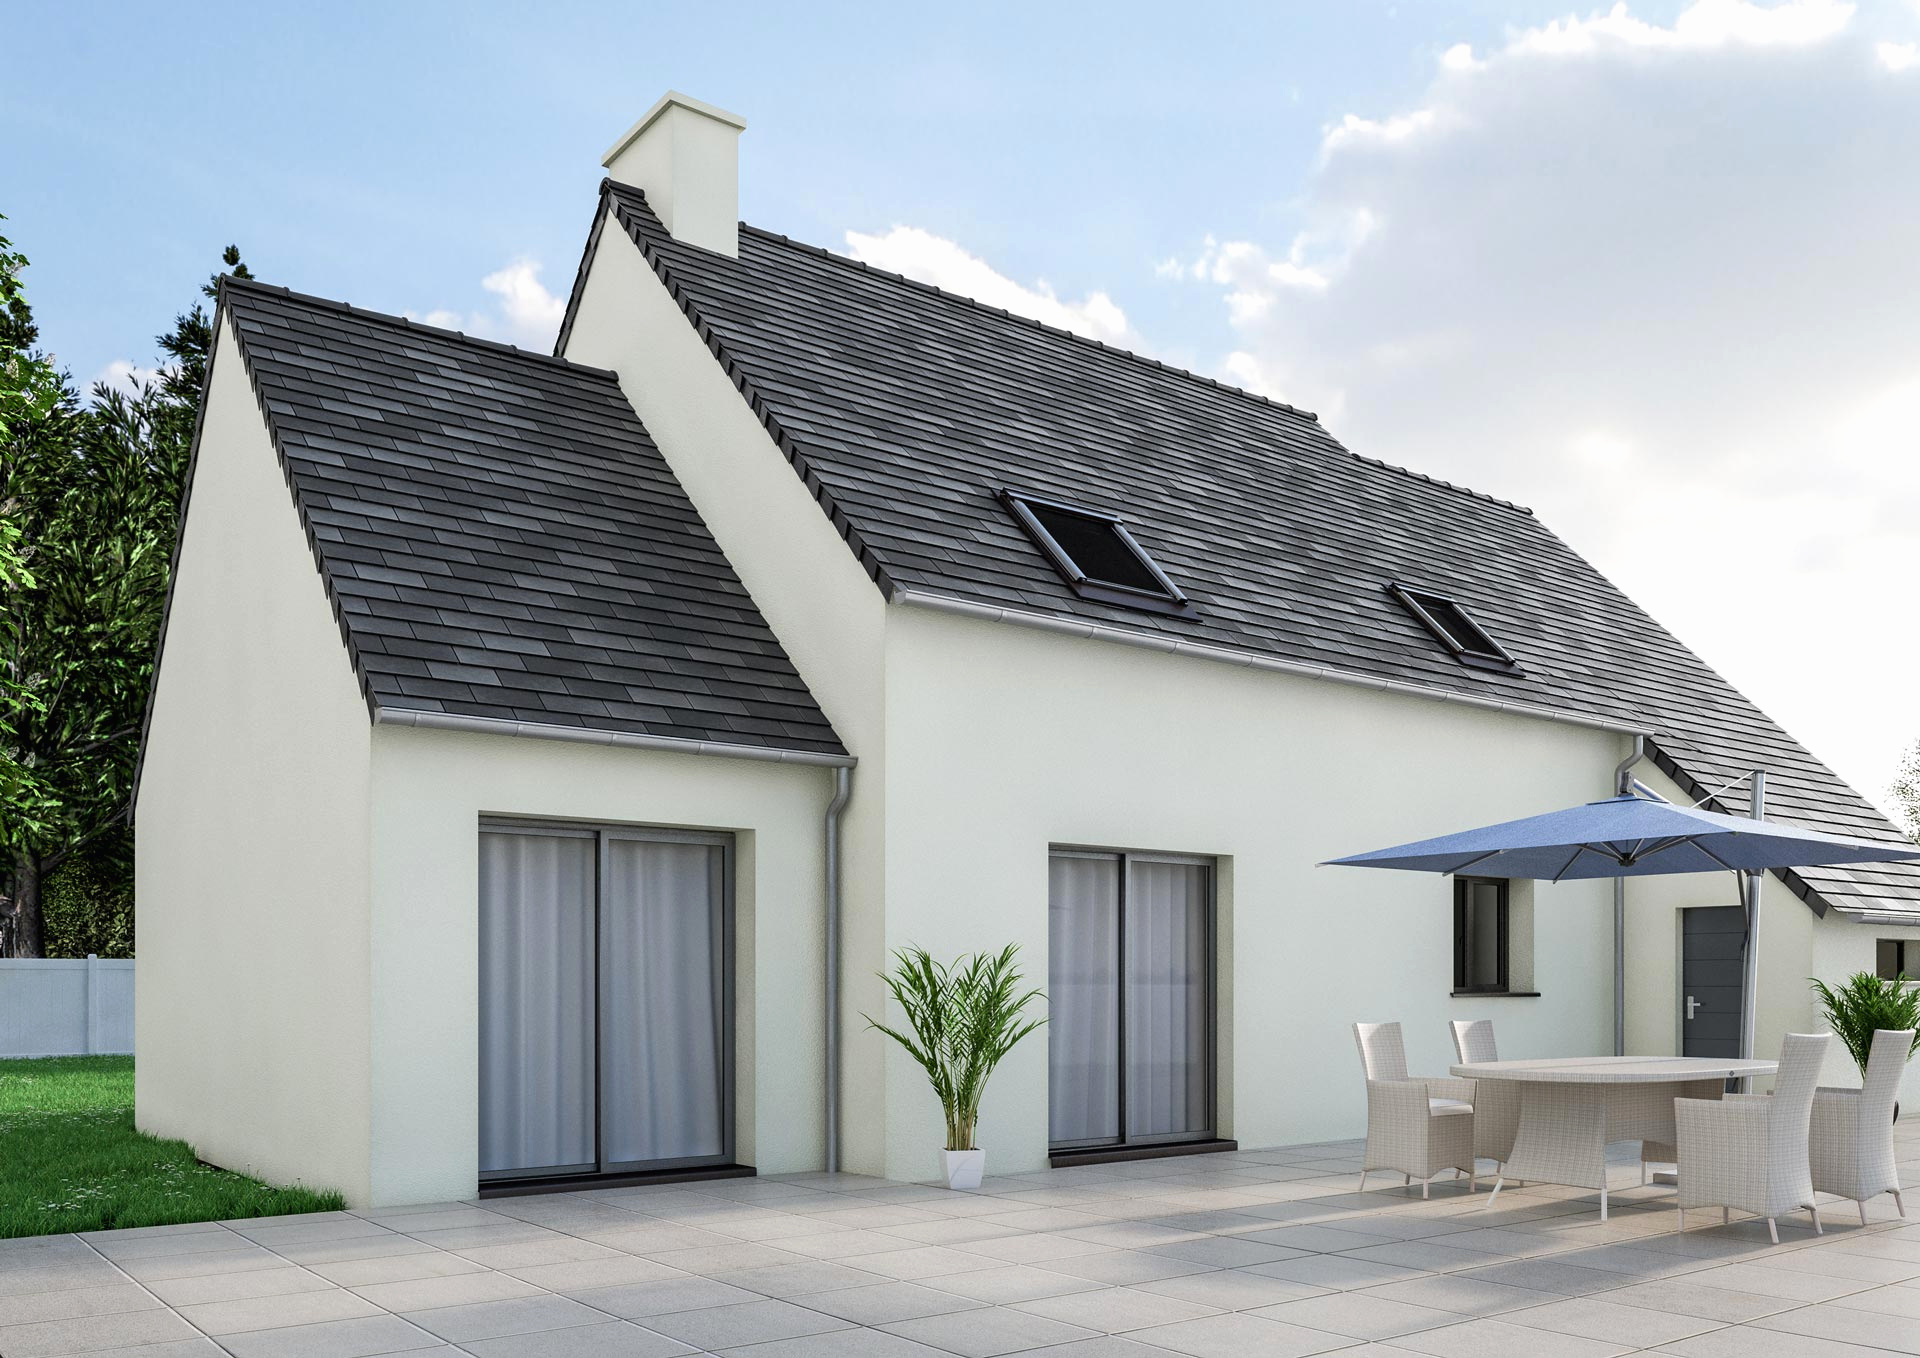 De Extension Maison toit Plat Prix – Raviraj